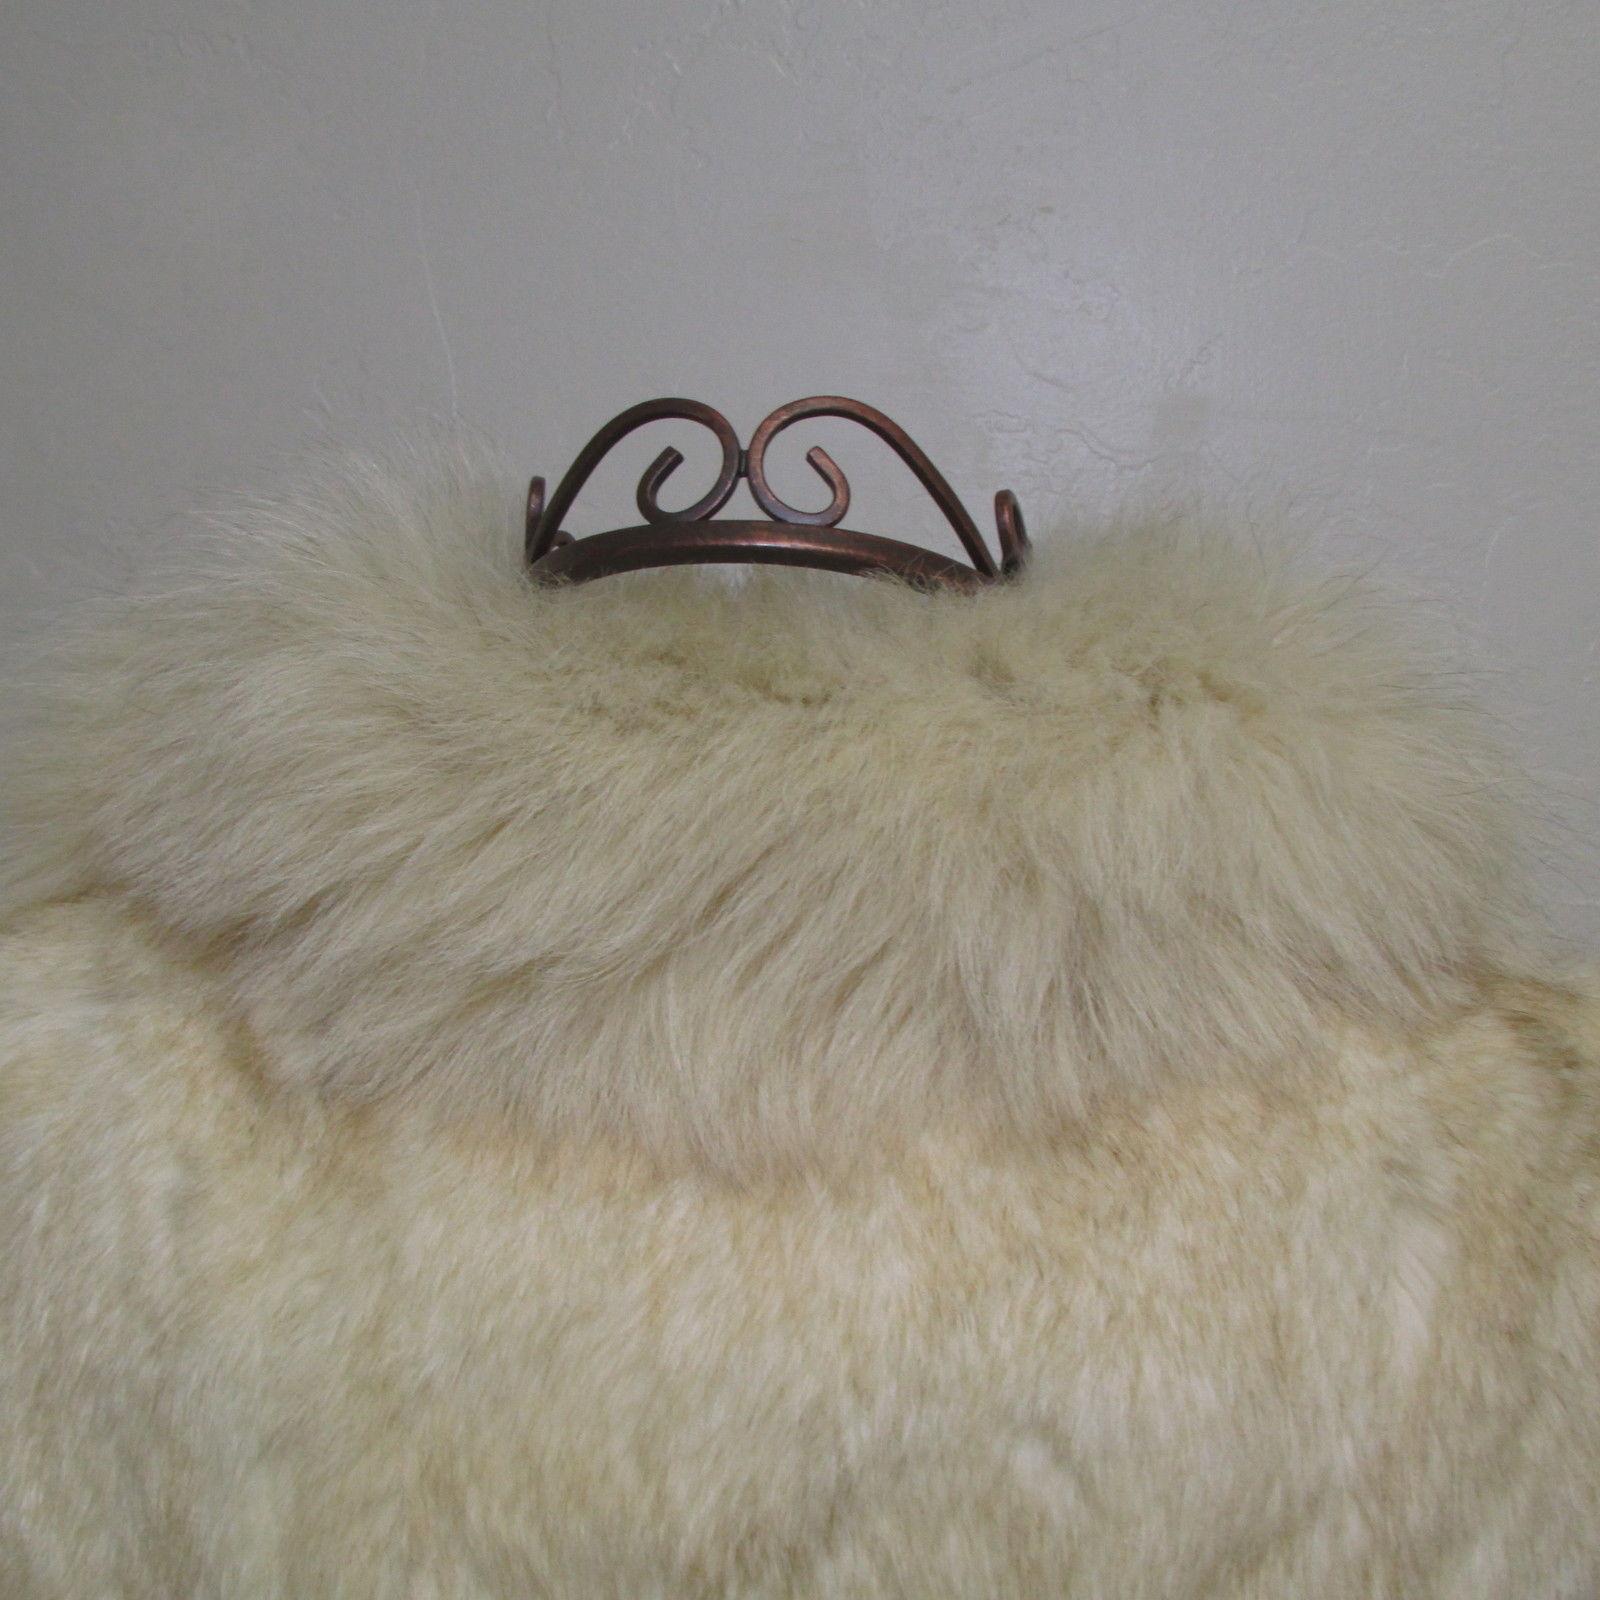 Luxuriously Soft Vintage Creamy Blonde Rabbit Waist Length Jacket Size M